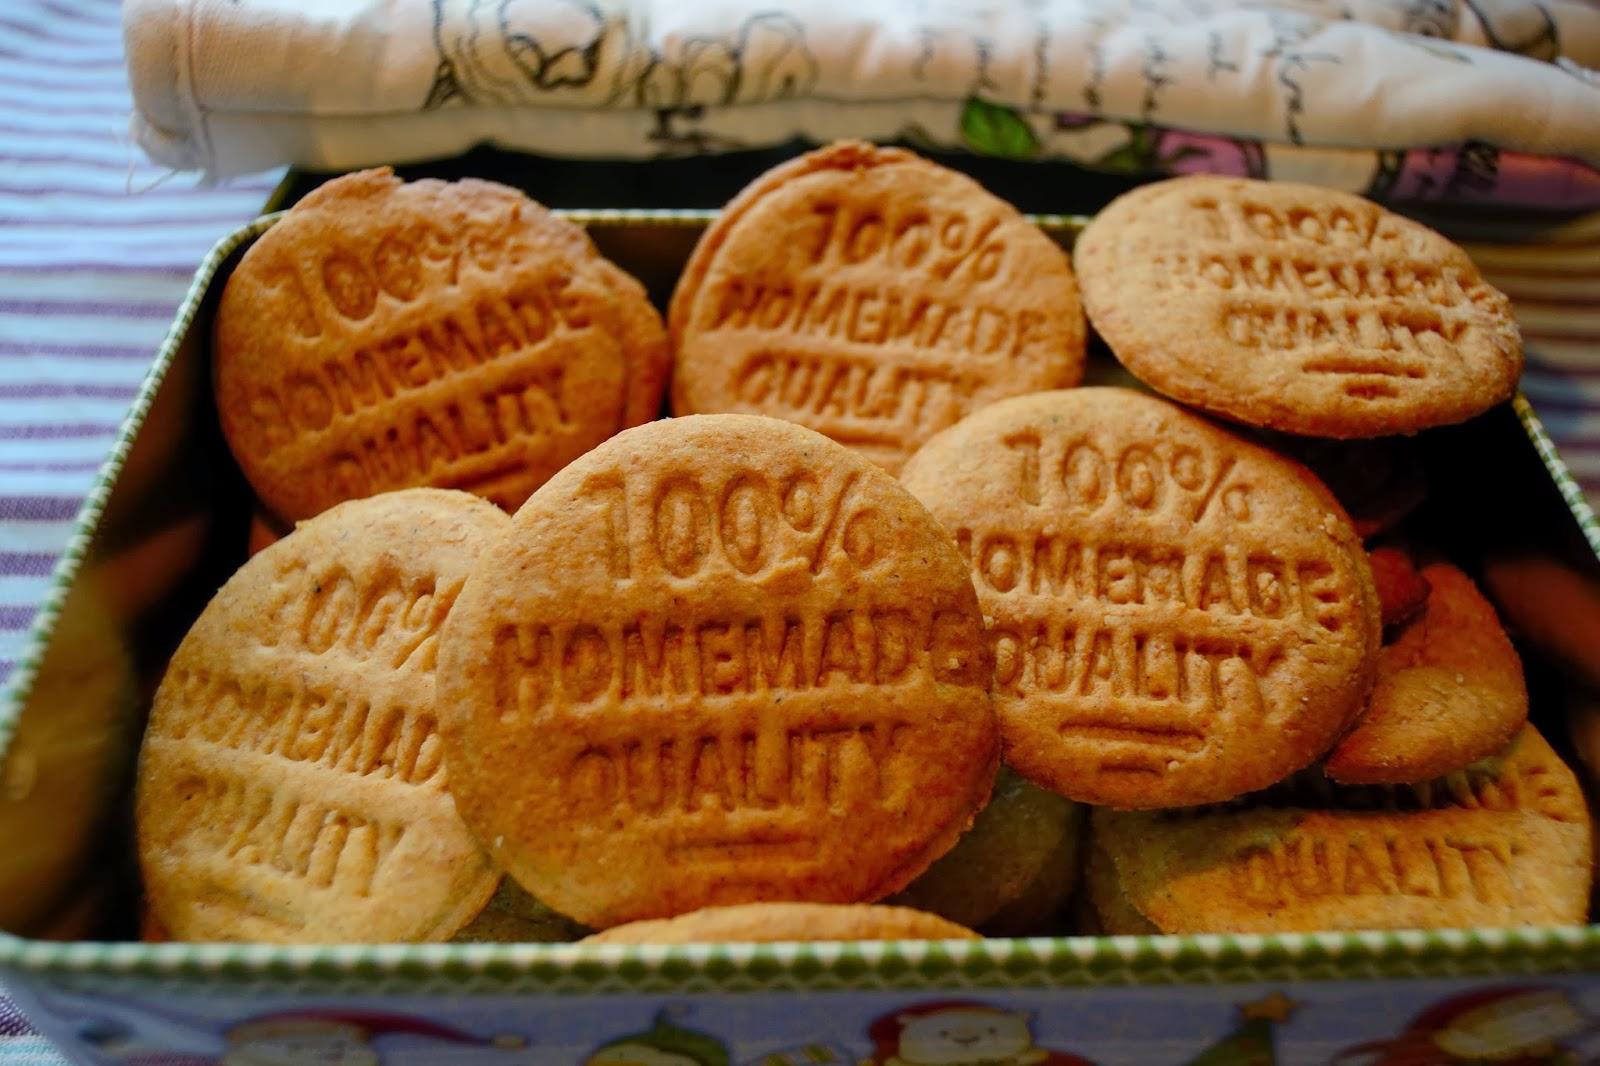 L rdagshygge galletitas de jengibre cocinar para nutrir for Cocinar 180 grados